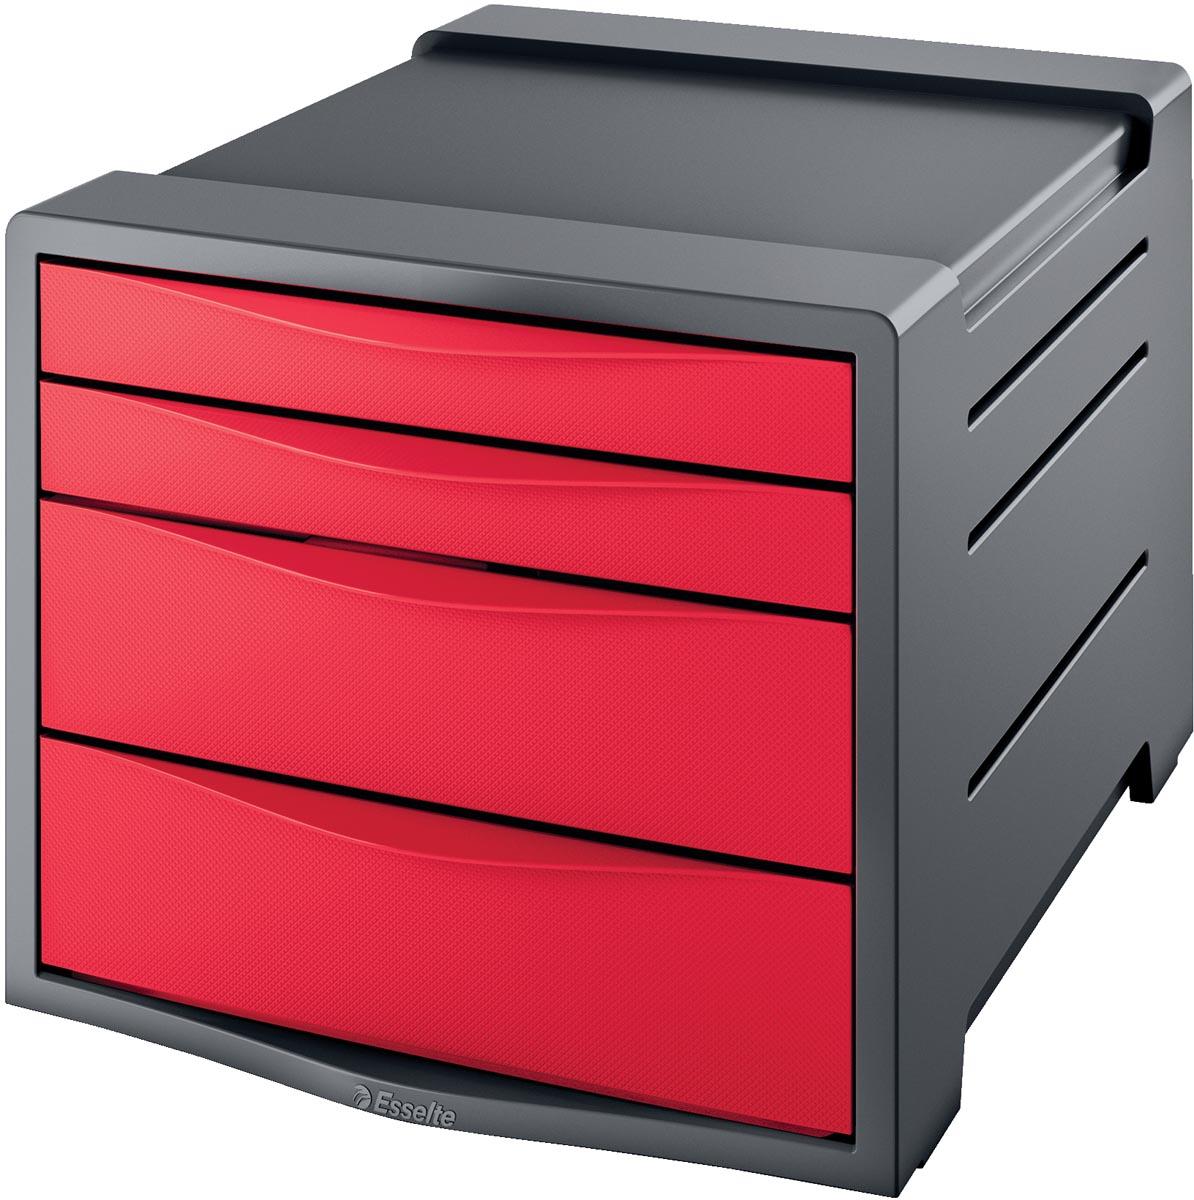 Ladenbox Esselte Vivida 4 laden rood